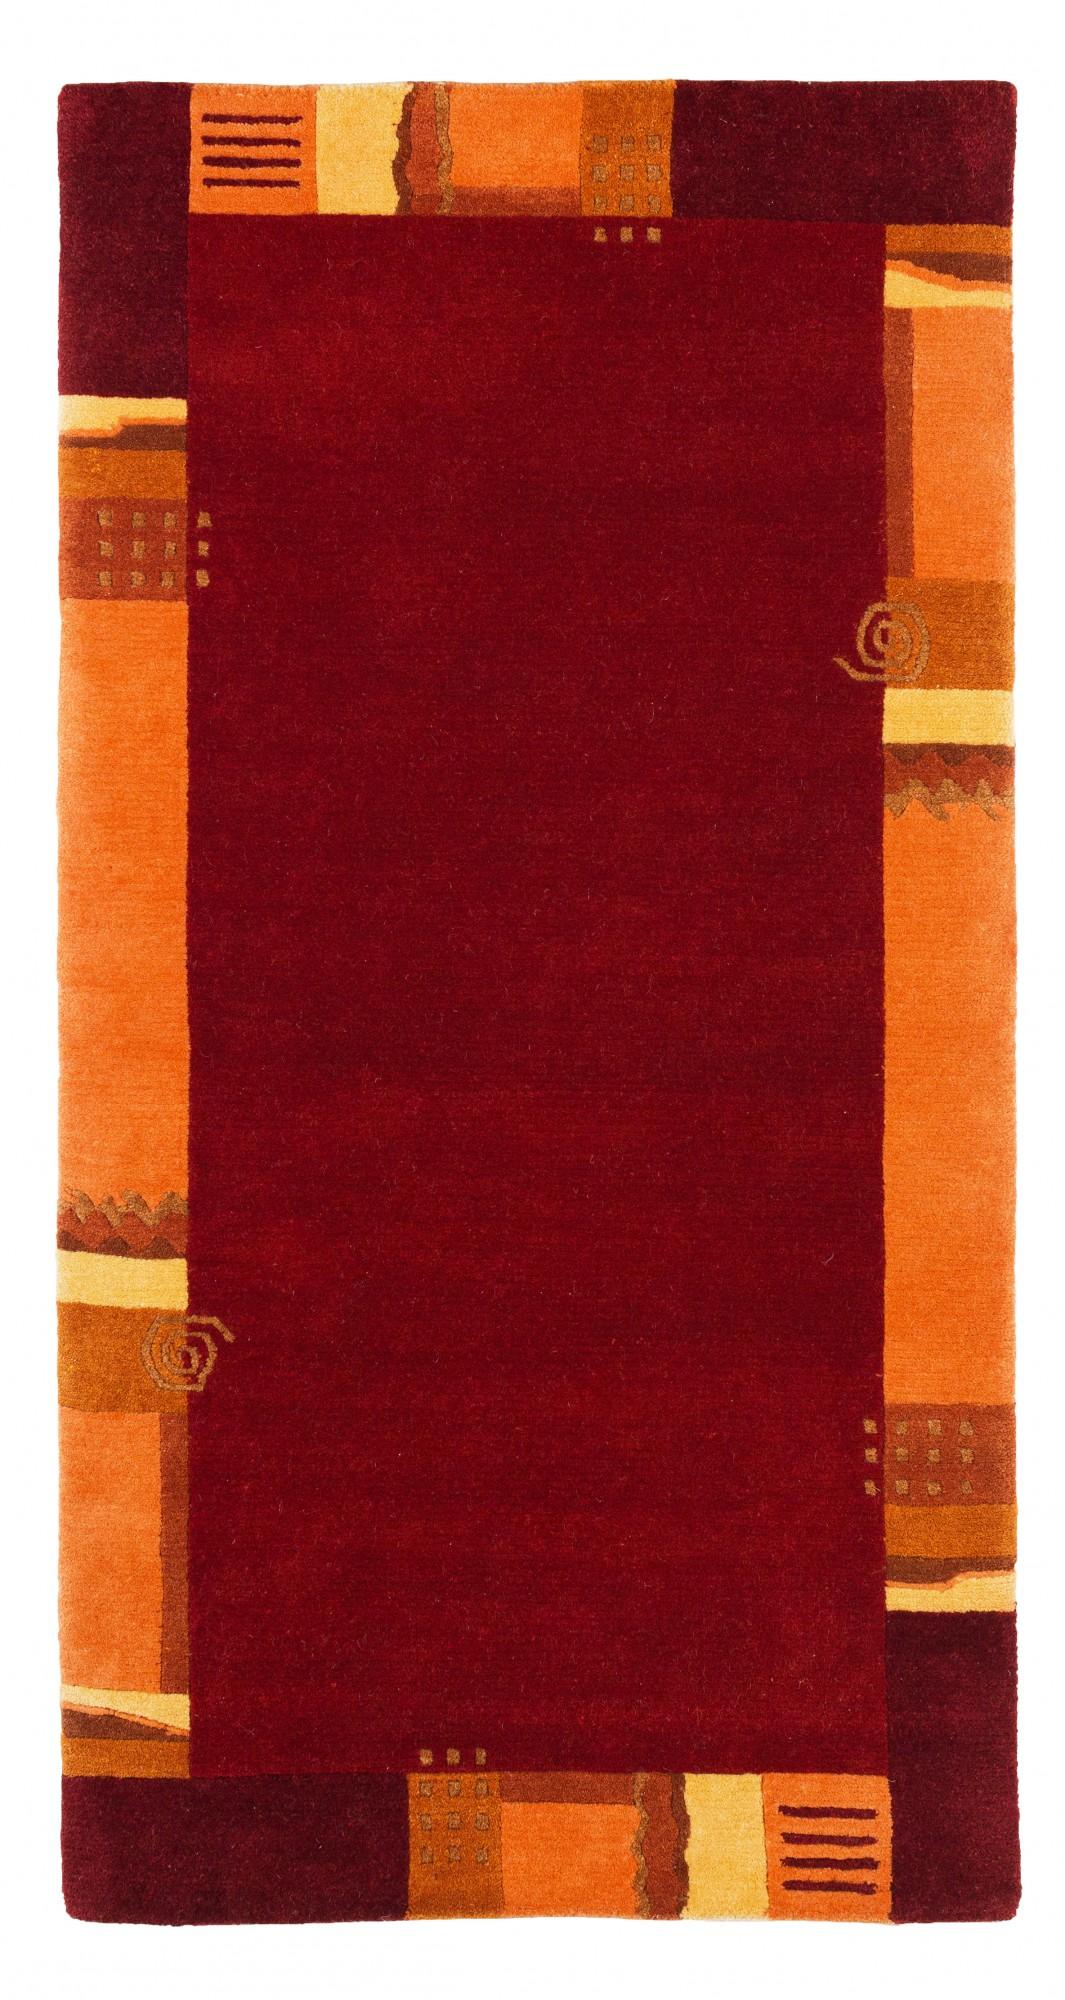 handgekn pfter original tibet nepal teppich shangrila 705 73x74 cm rot ebay. Black Bedroom Furniture Sets. Home Design Ideas